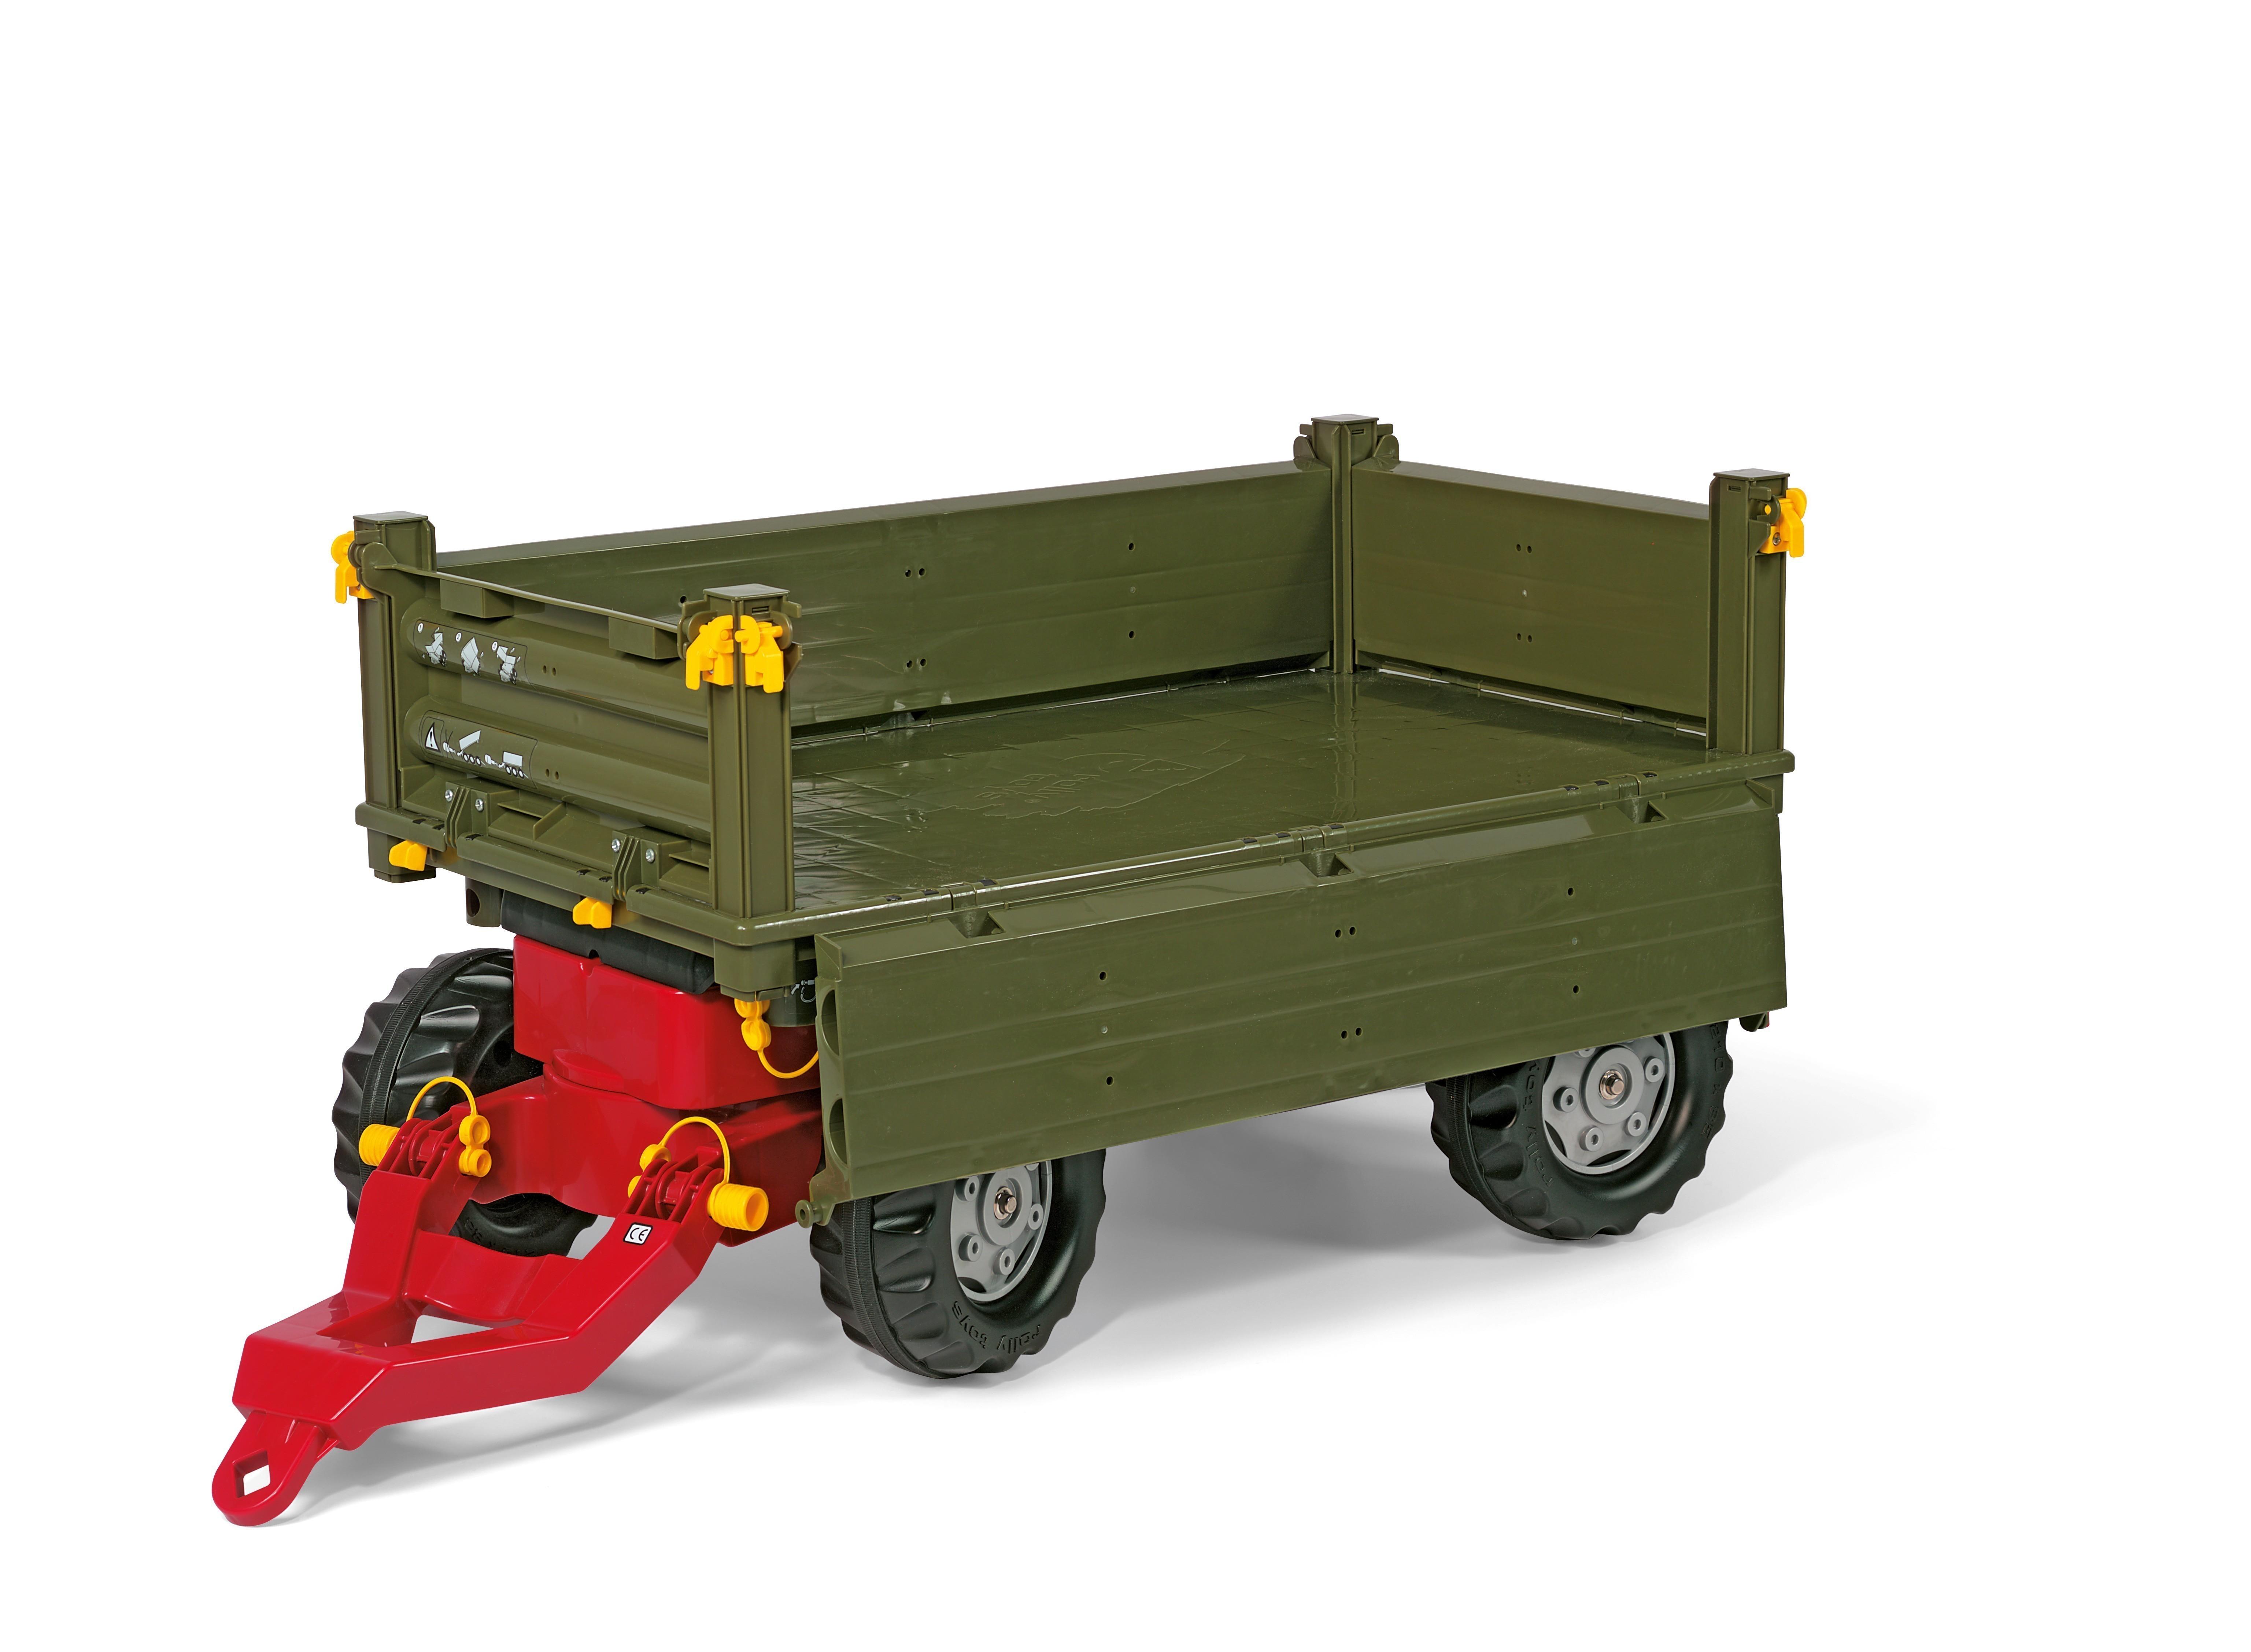 Anhänger für Tretfahrzeug rolly Multi Trailer grün - Rolly Toys Bild 4